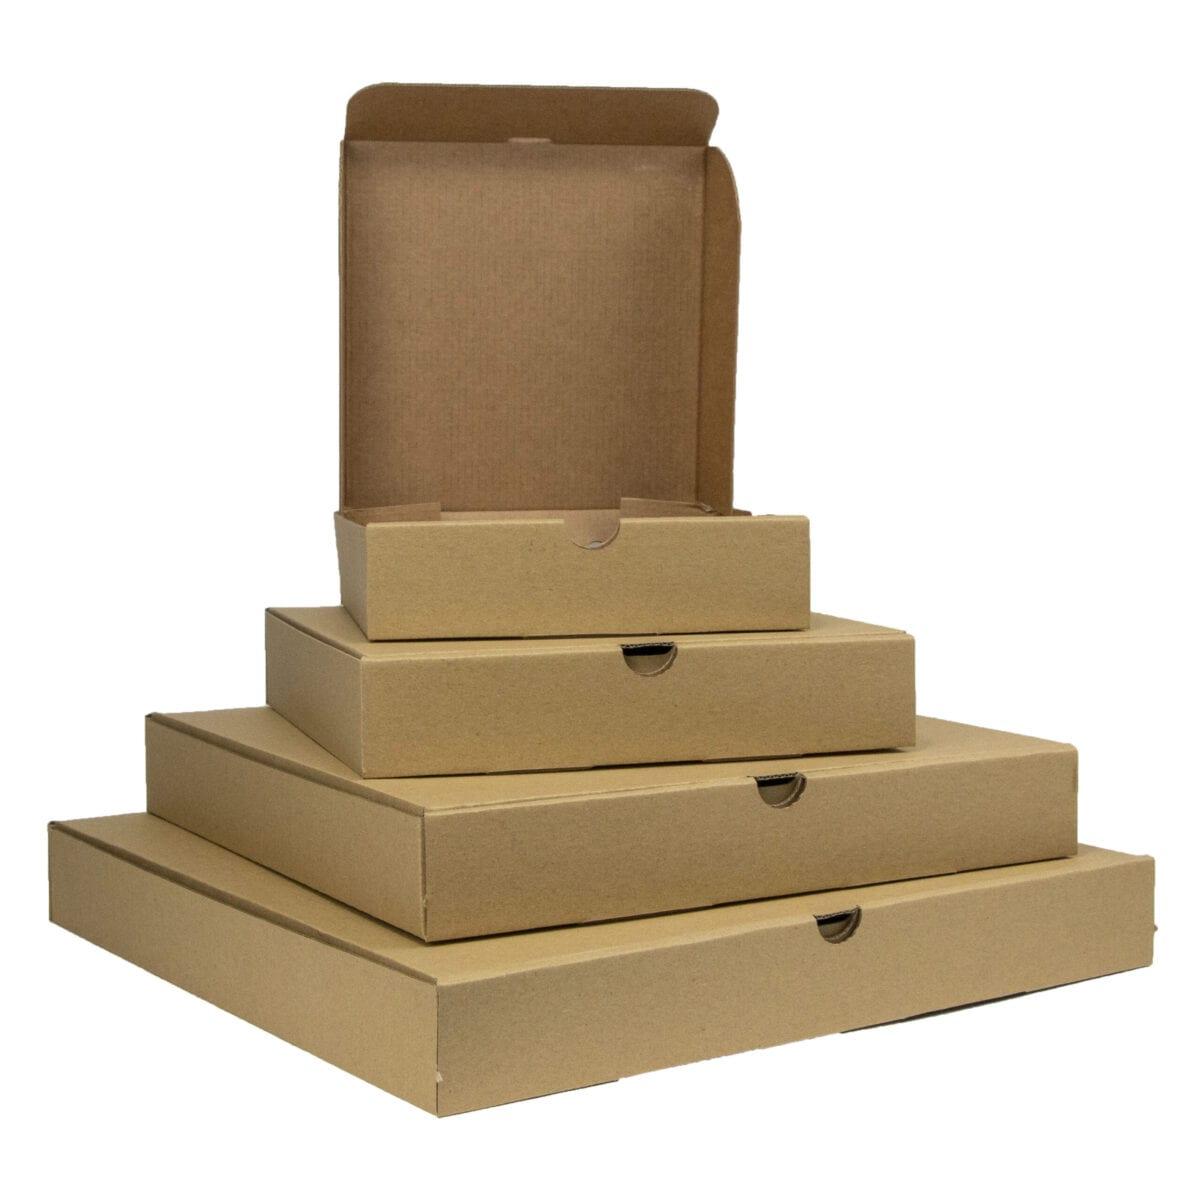 Pizza Boxes Sub Cat Image